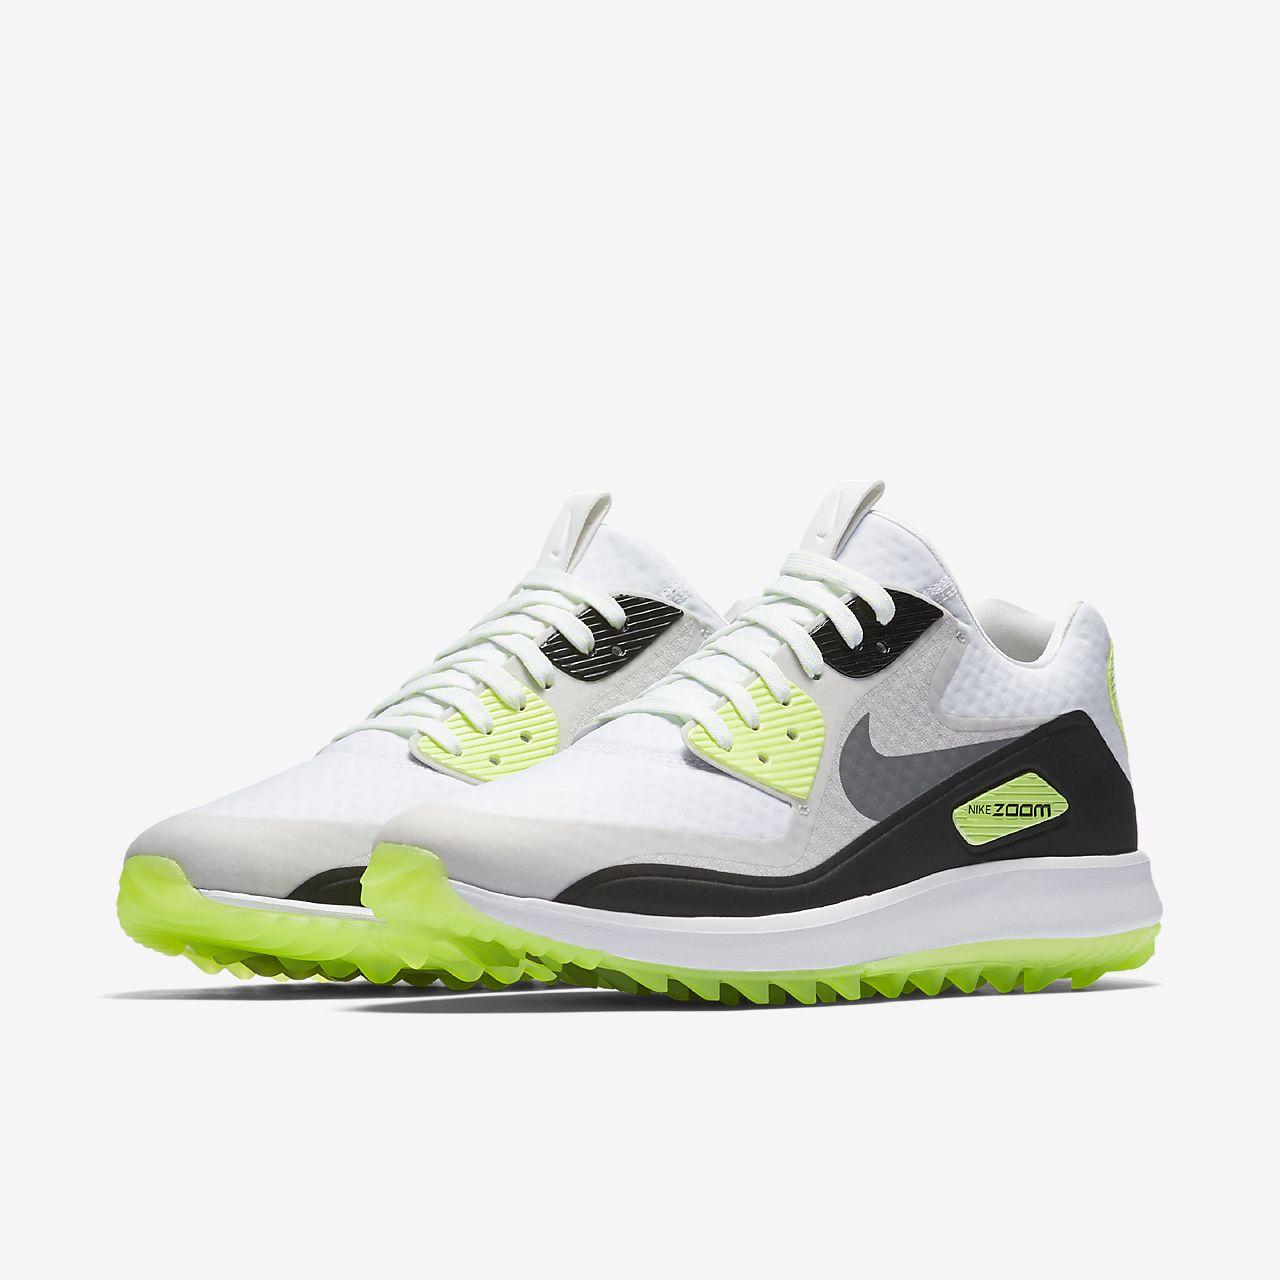 ... Nike Air Zoom 90 IT Men's Golf Shoe